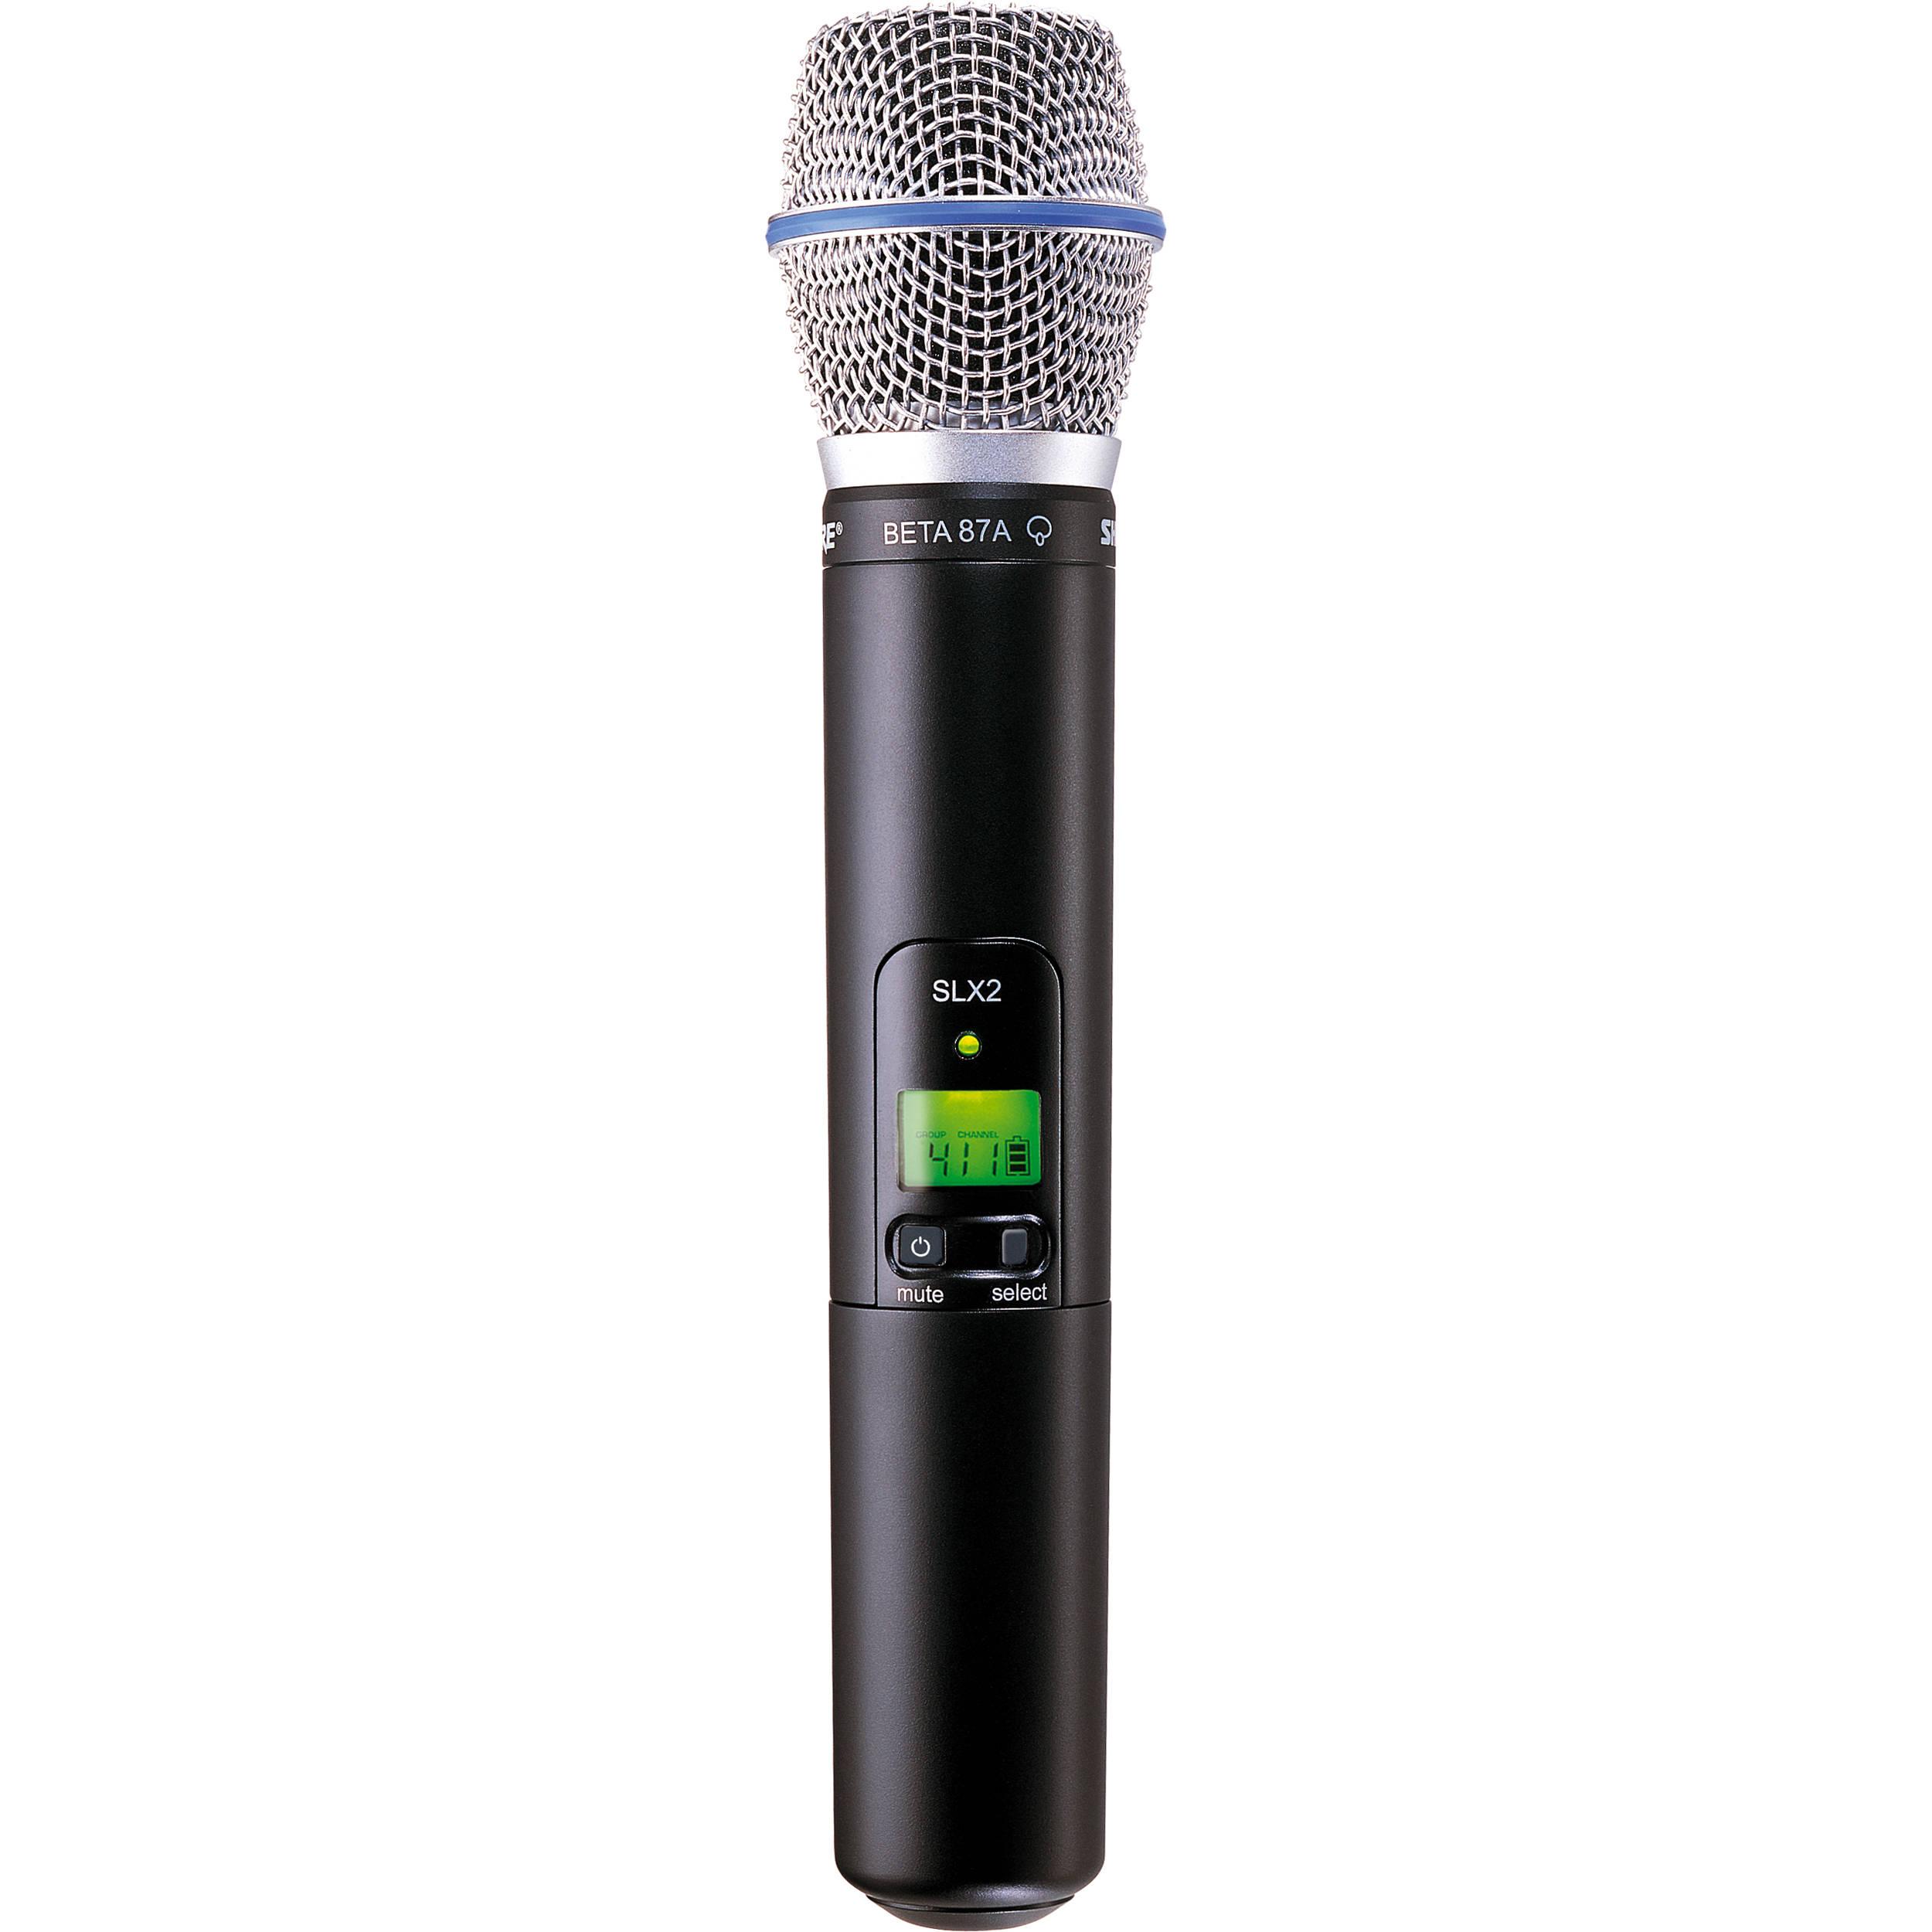 Shure Slx2 Handheld Wireless Uhf Transmitter With Sm58 Microphone : shure slx2 handheld wireless uhf transmitter slx2 beta87a h19 ~ Russianpoet.info Haus und Dekorationen